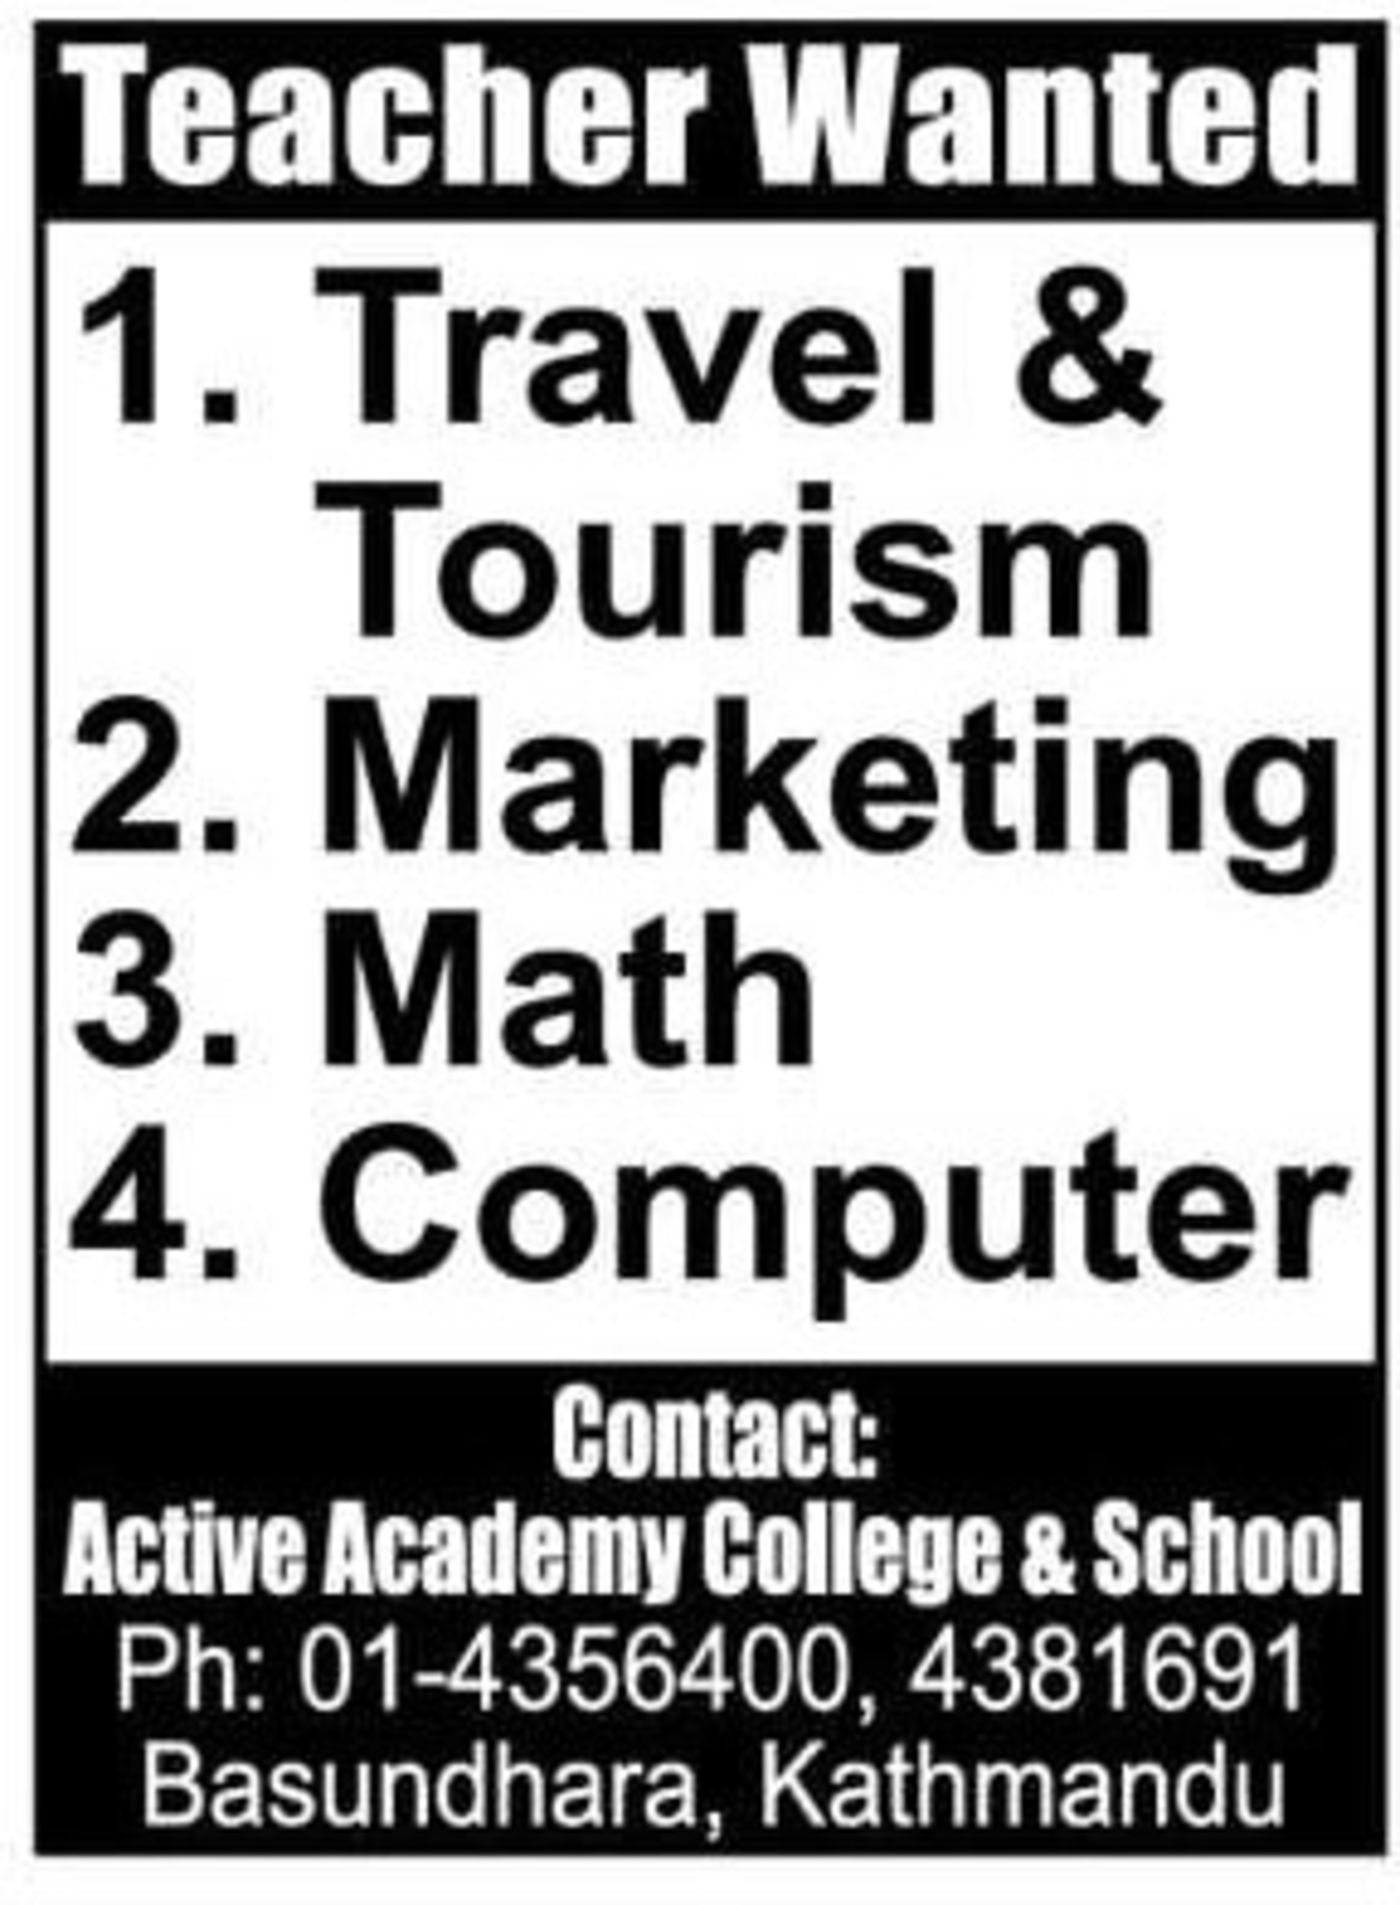 Jobs Nepal - Vacancy - Travel & Tourism, Marketing, Math and